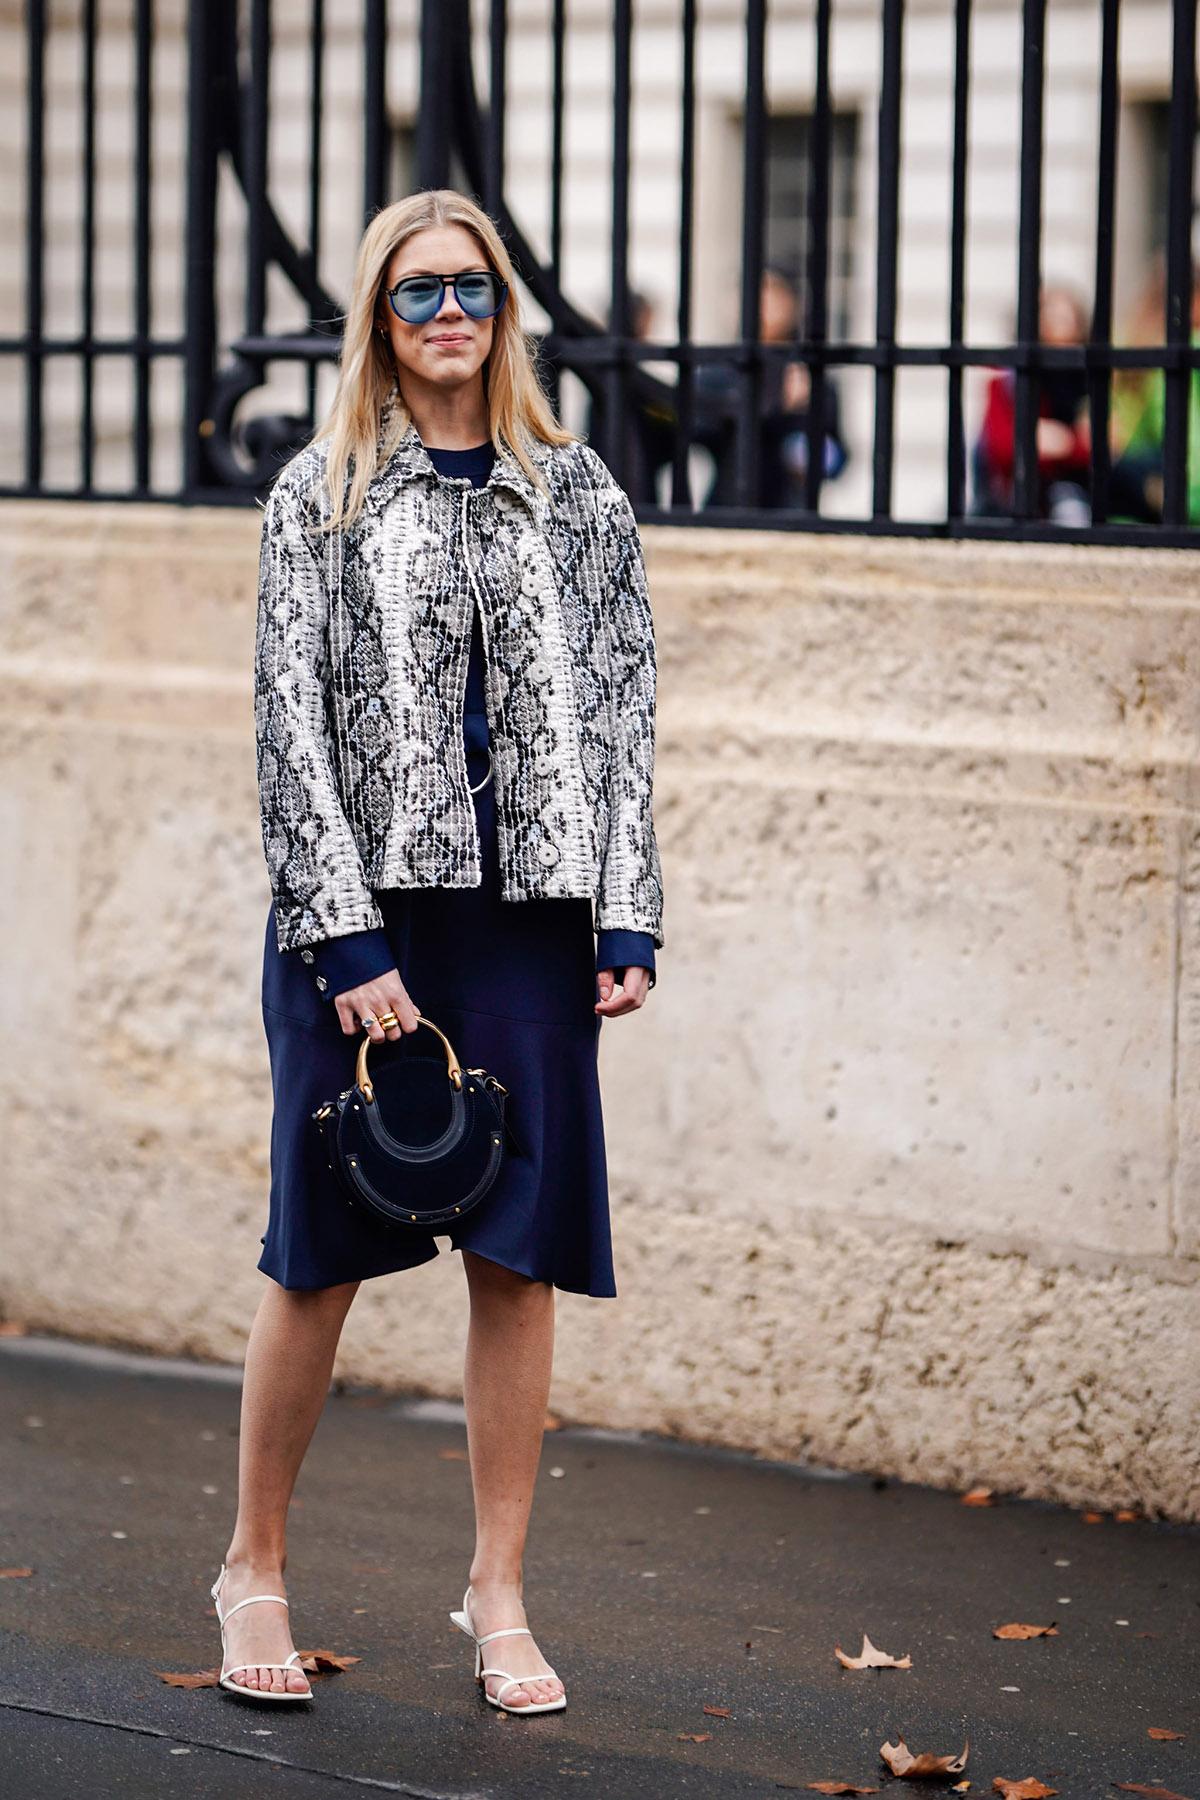 Style-your-minimalist-sandals-snakeskin-print-jacket-navy